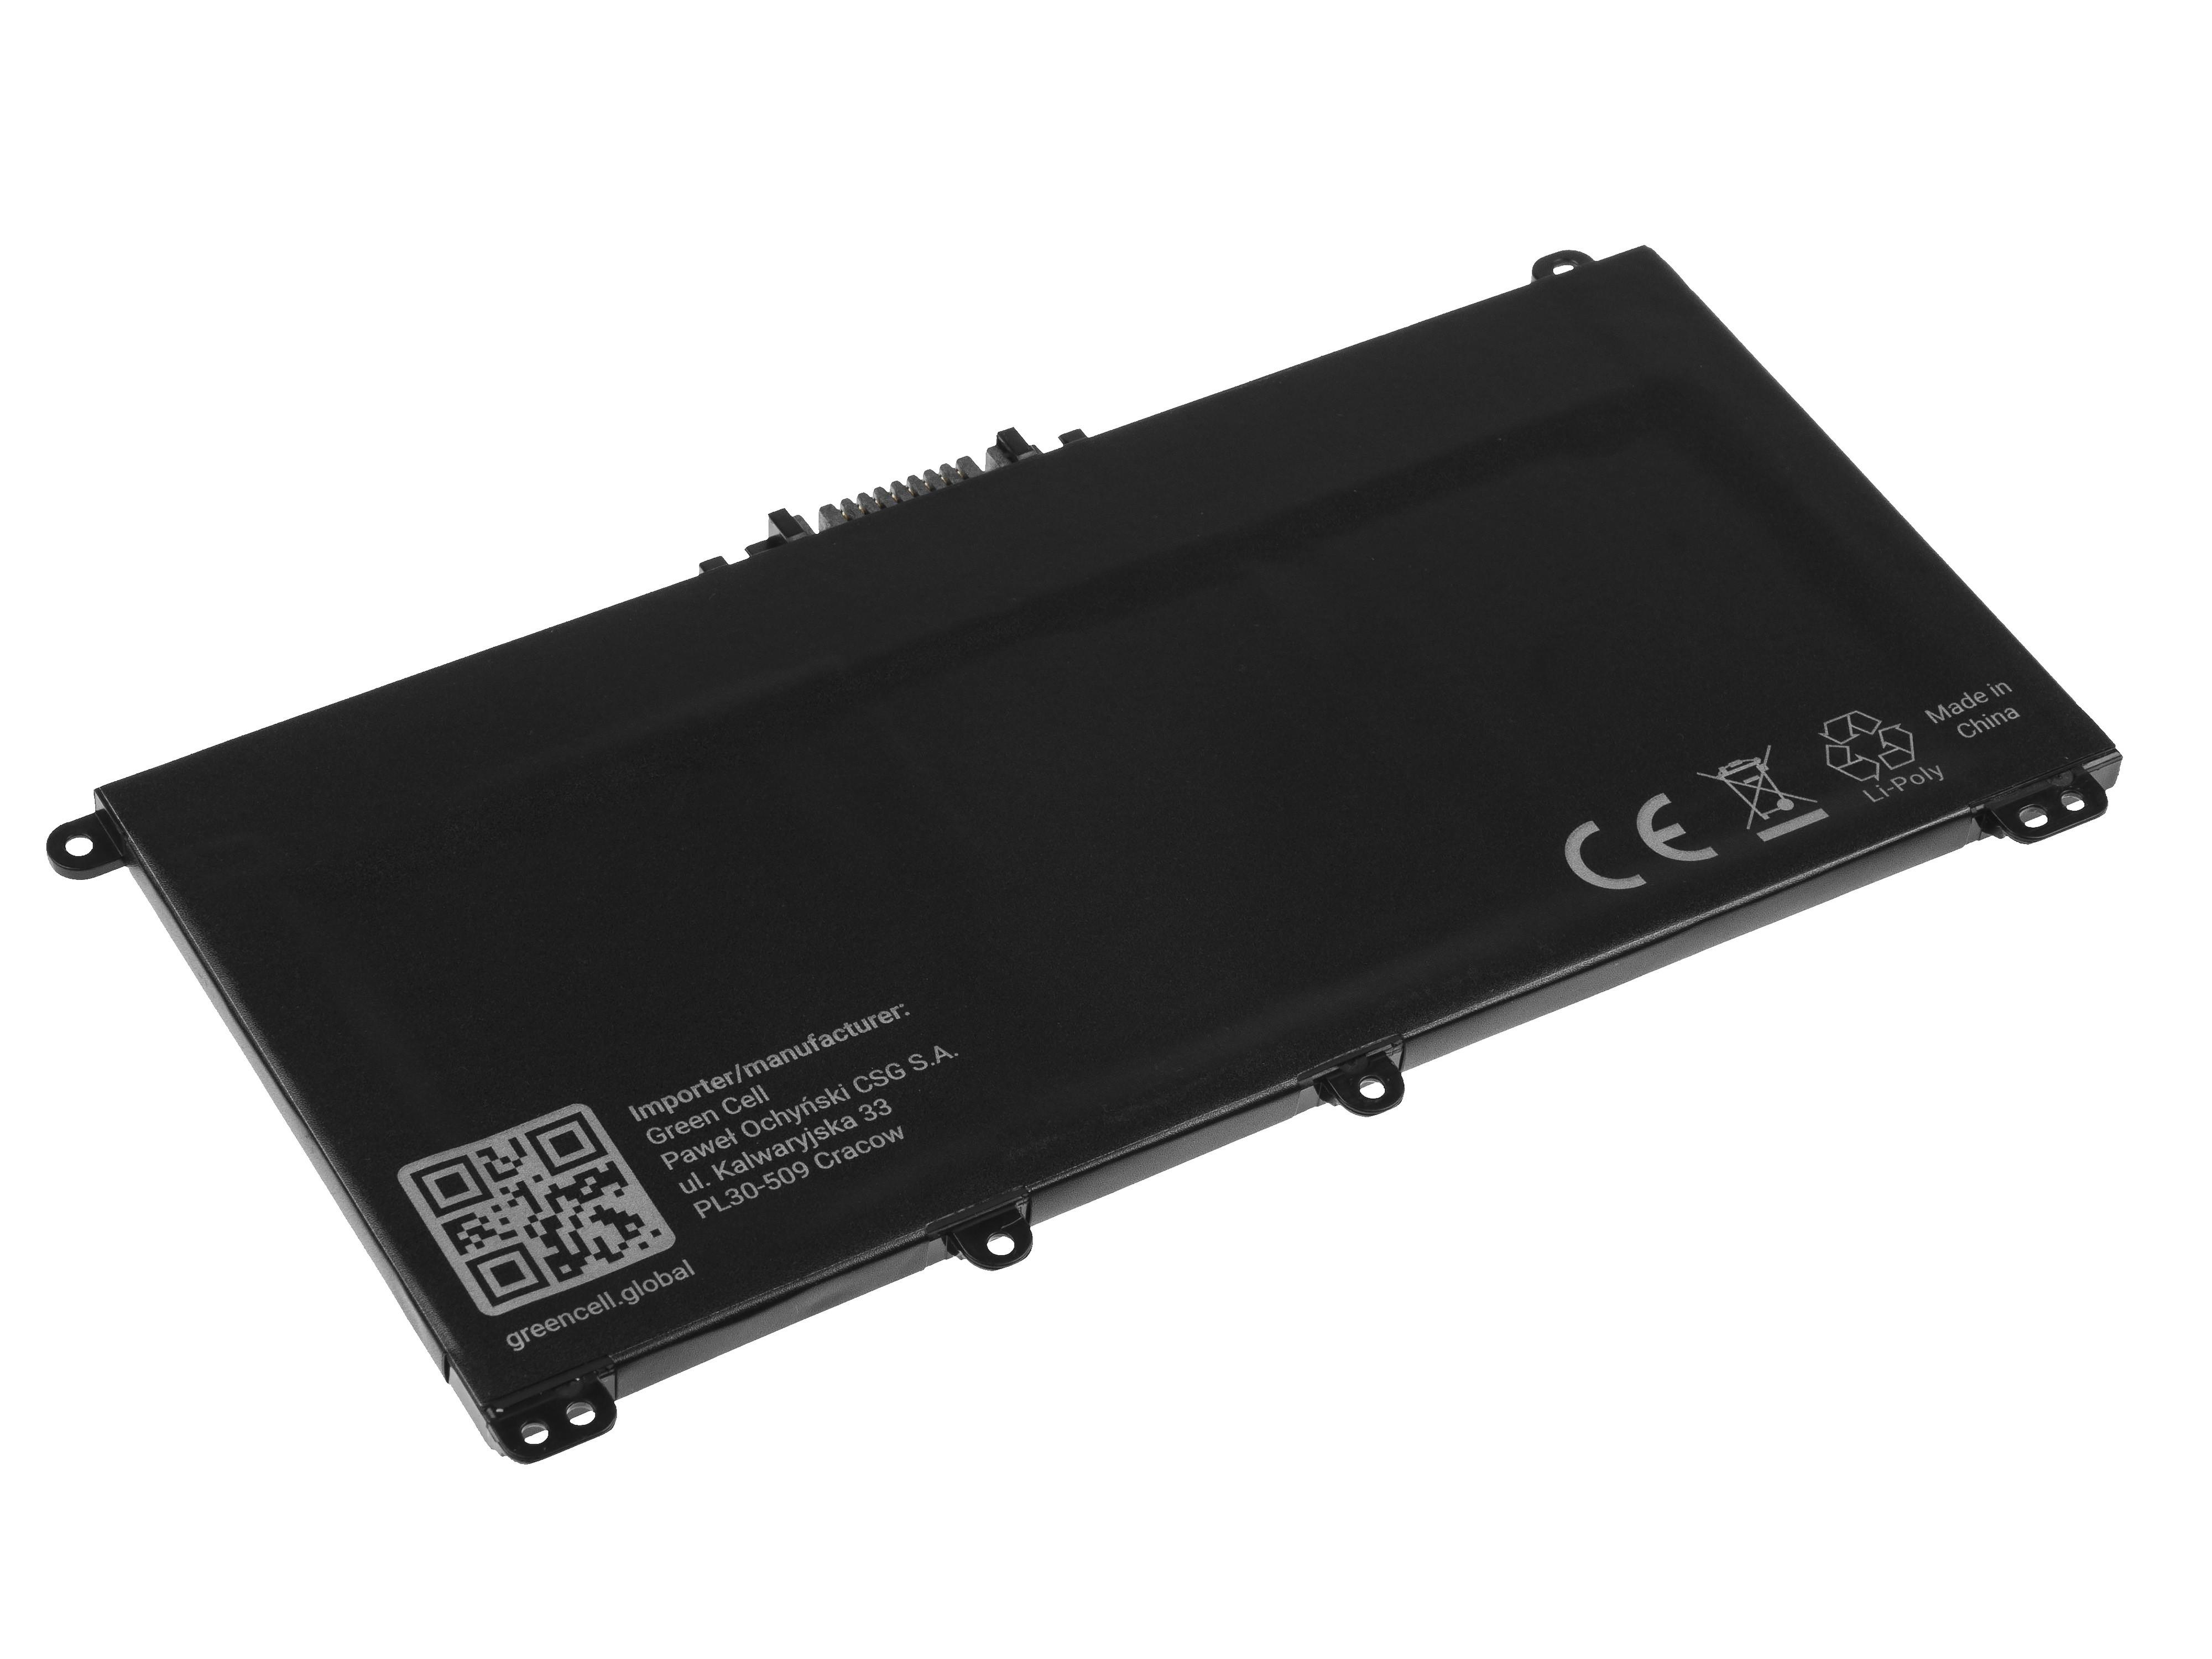 Green Cell Laptop Baterie Baterie HT03XL pro HP 240 G7 245 G7 250 G7 255 G7, HP 14 15 17, HP Pavilion 14 15